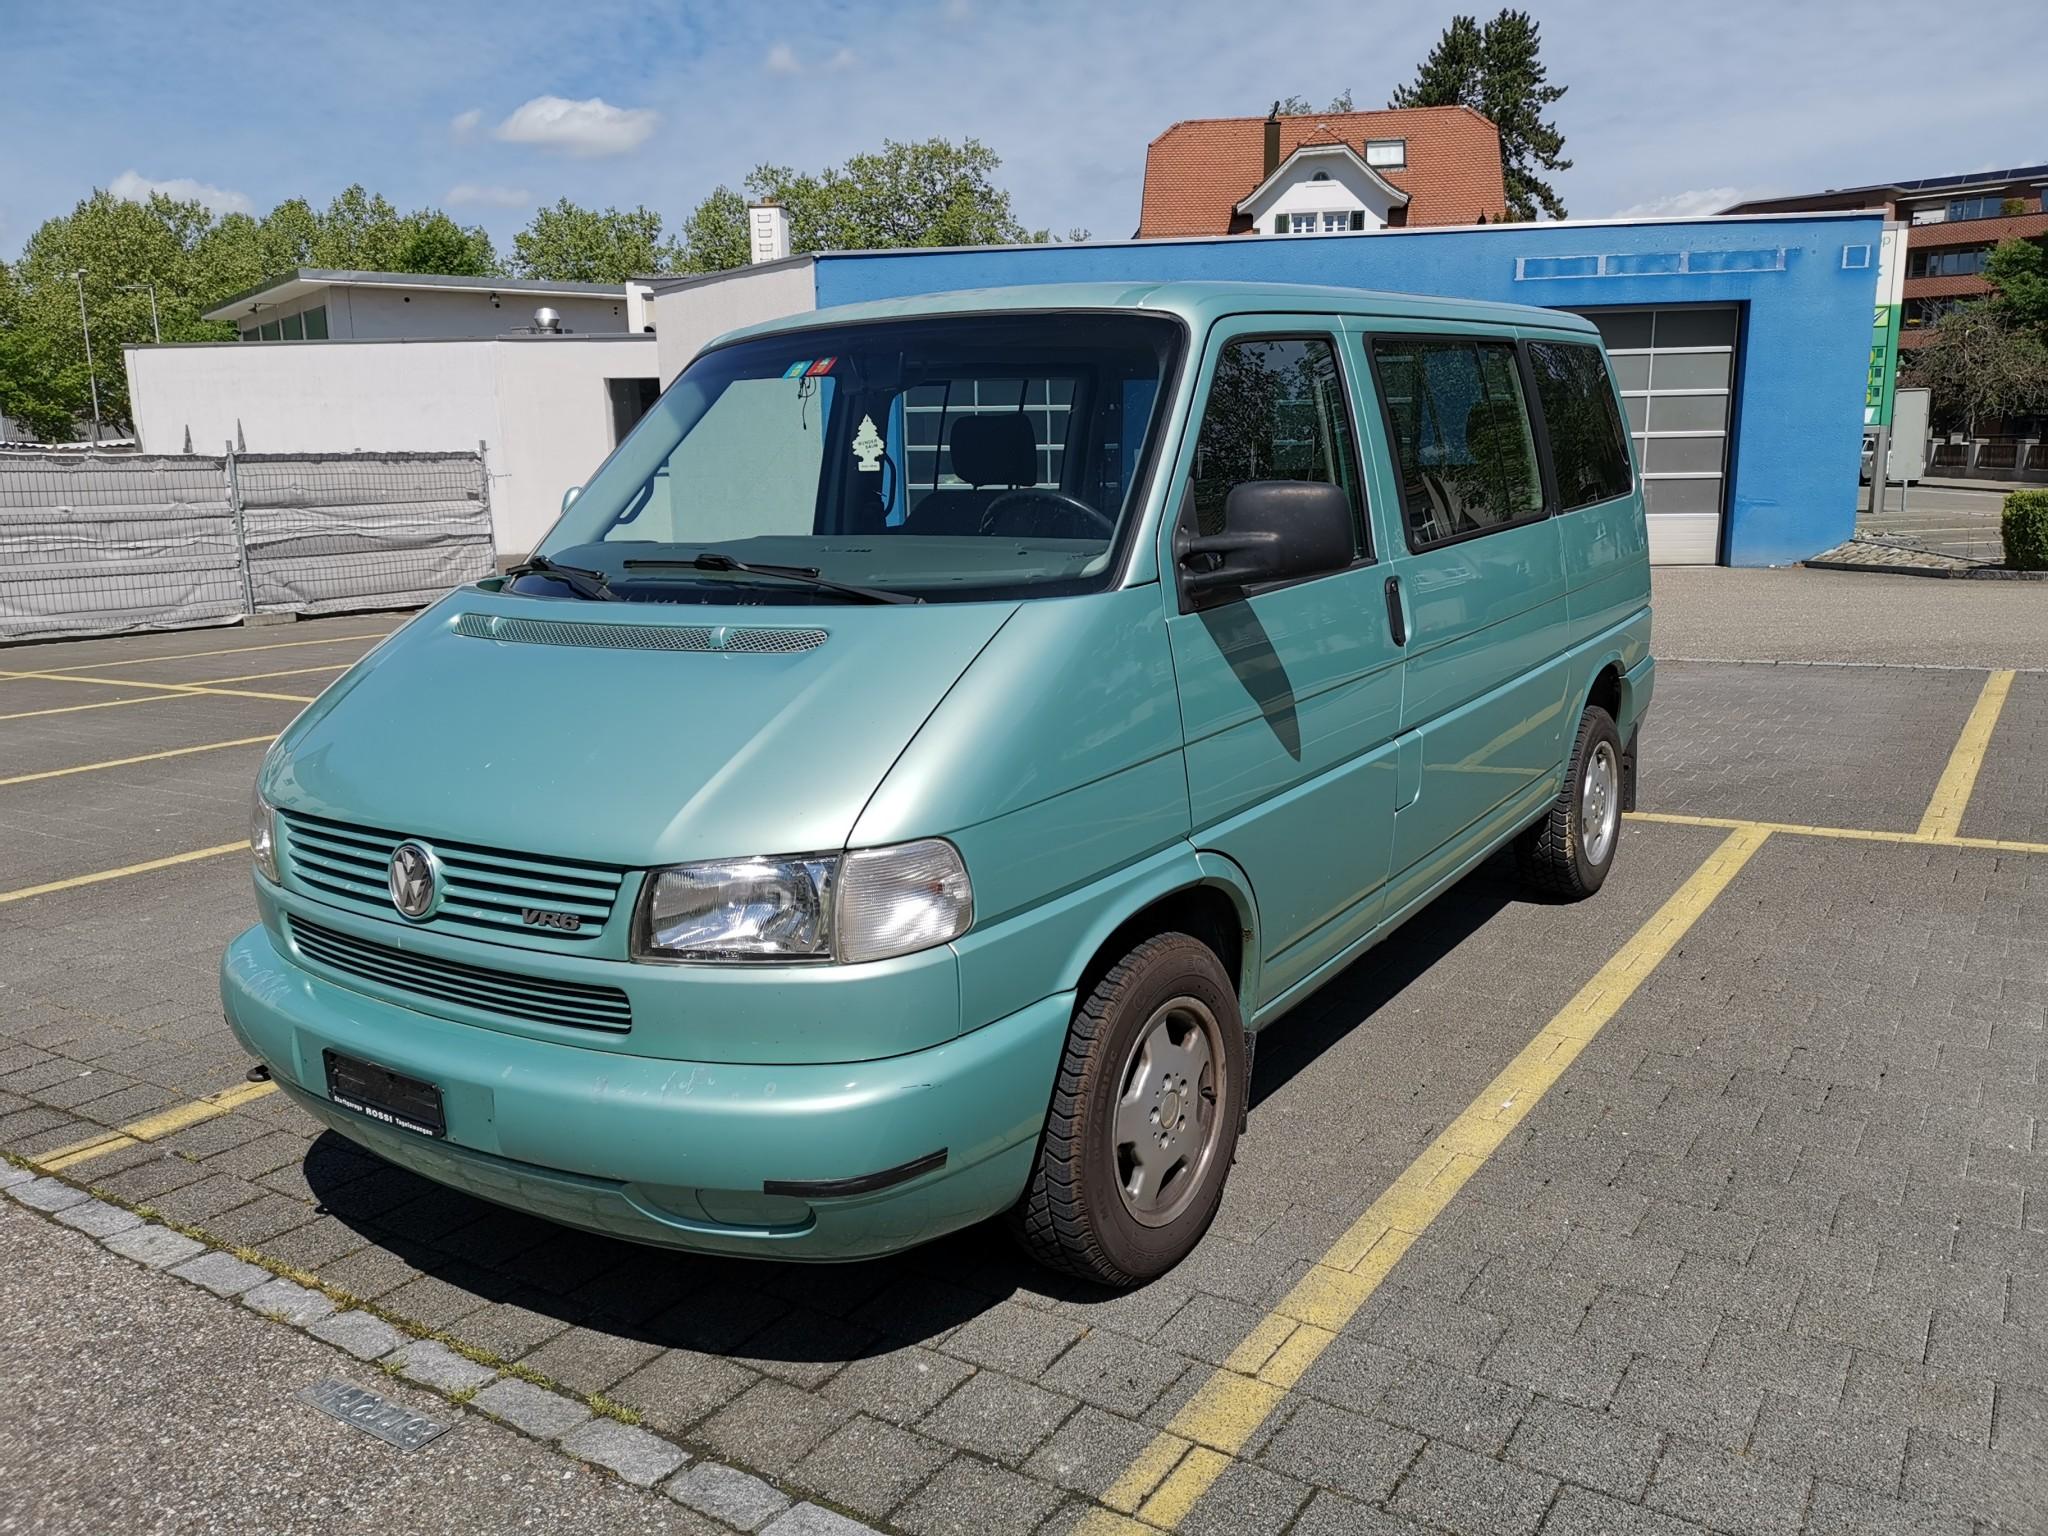 bus VW T4 Bus 2.8 l VR6 - inkl. aufblasbares Camping-Vorzelt